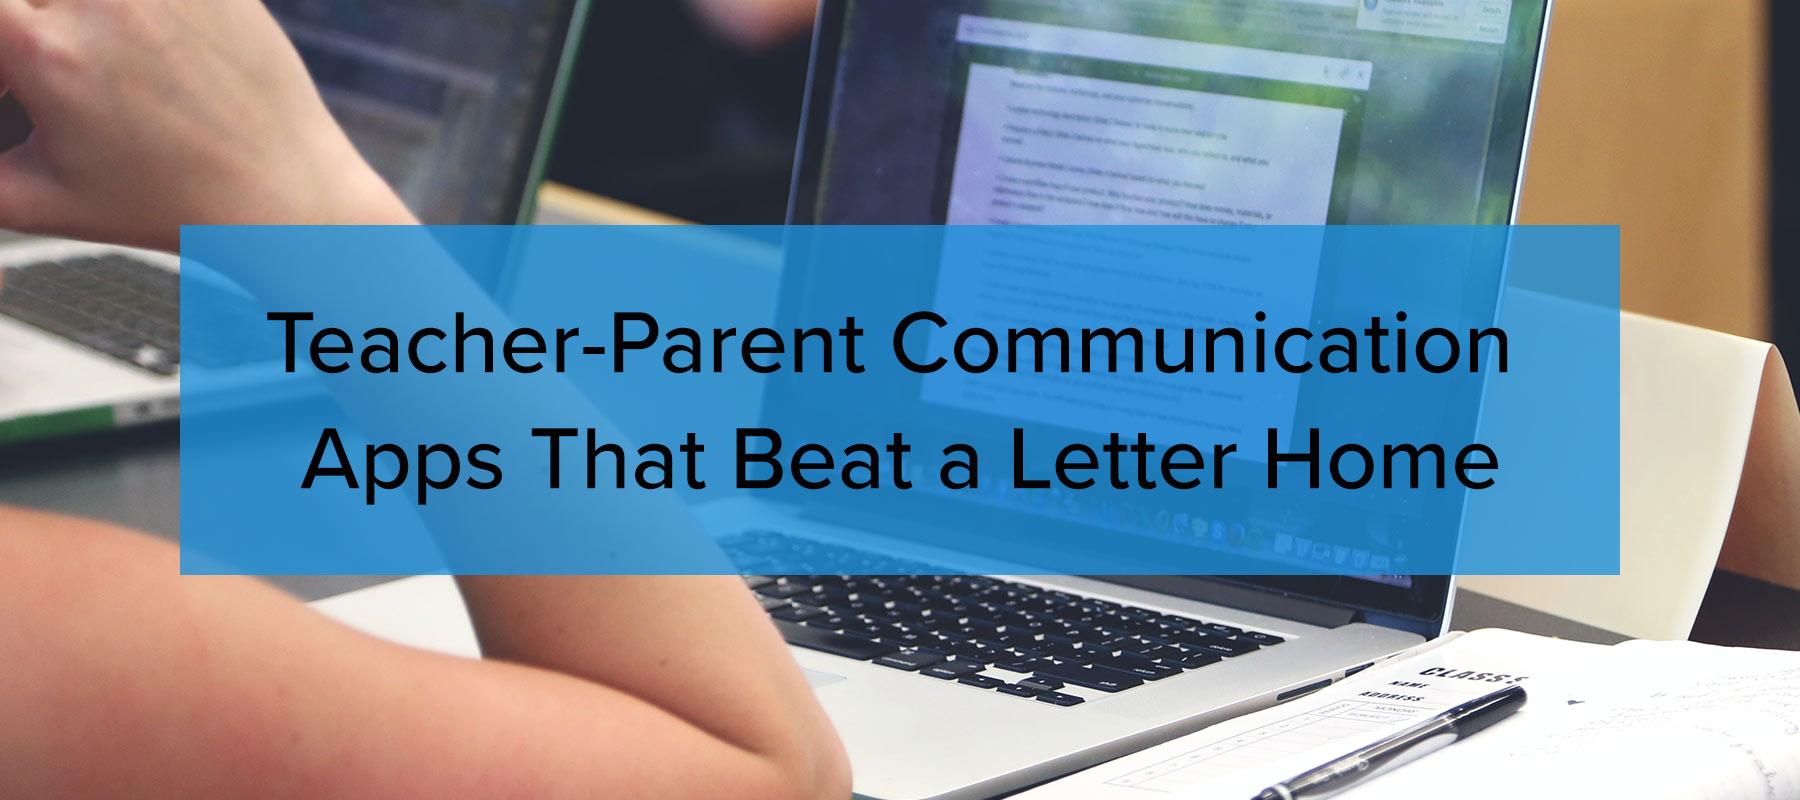 Teacher-Parent Communication Apps